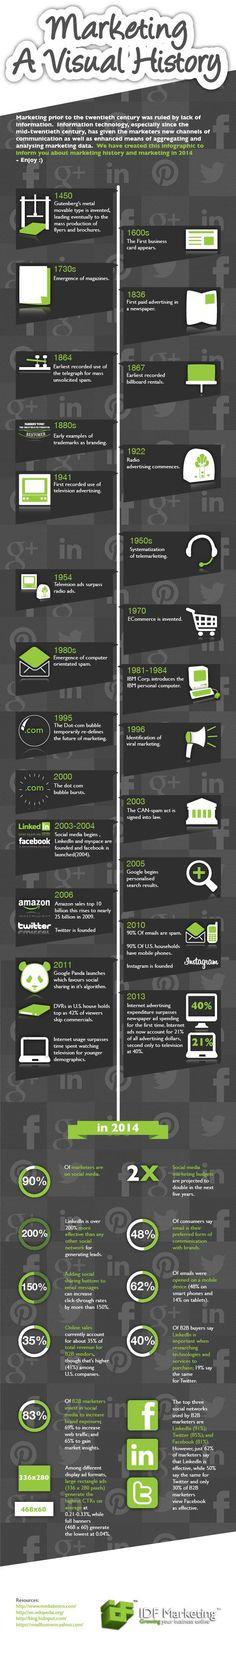 Plan A Link - Marketing: A Visual History